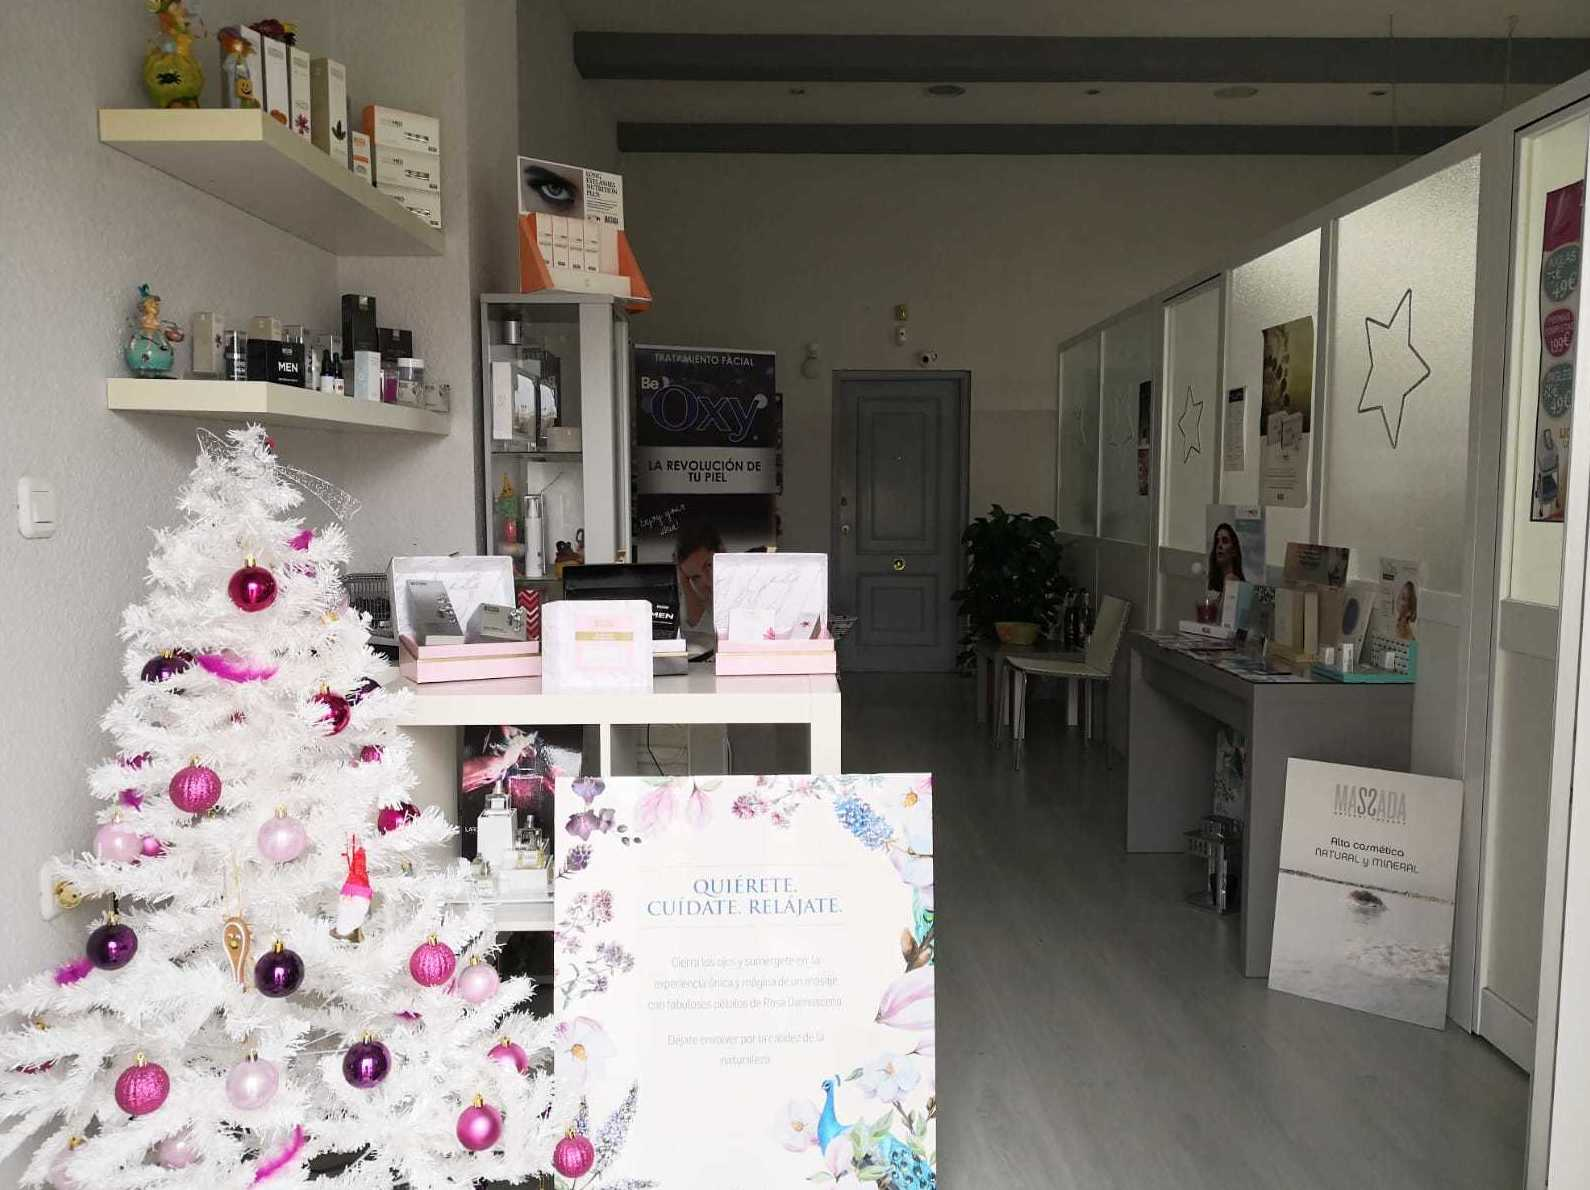 Centro de Estética Vanessa os desea feliz Navidad